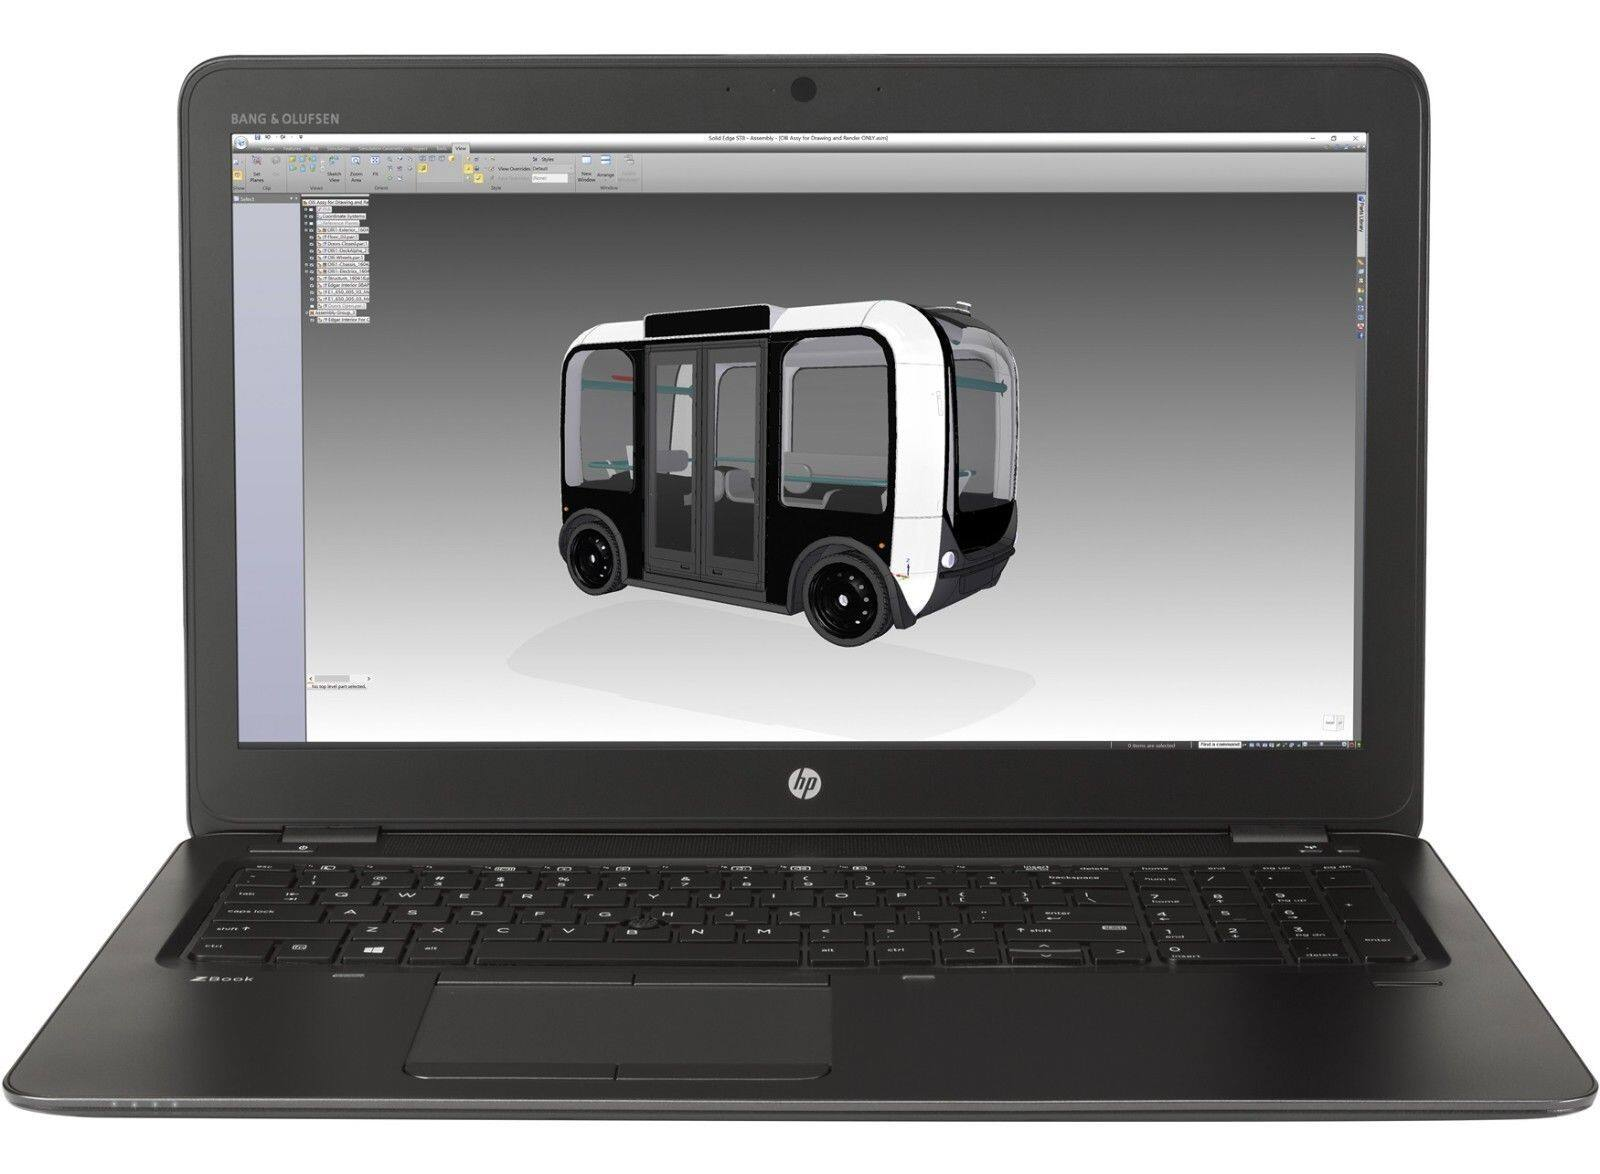 HP ZBook 15u G4 Workstation (Reburbished HP Grade A) $1050